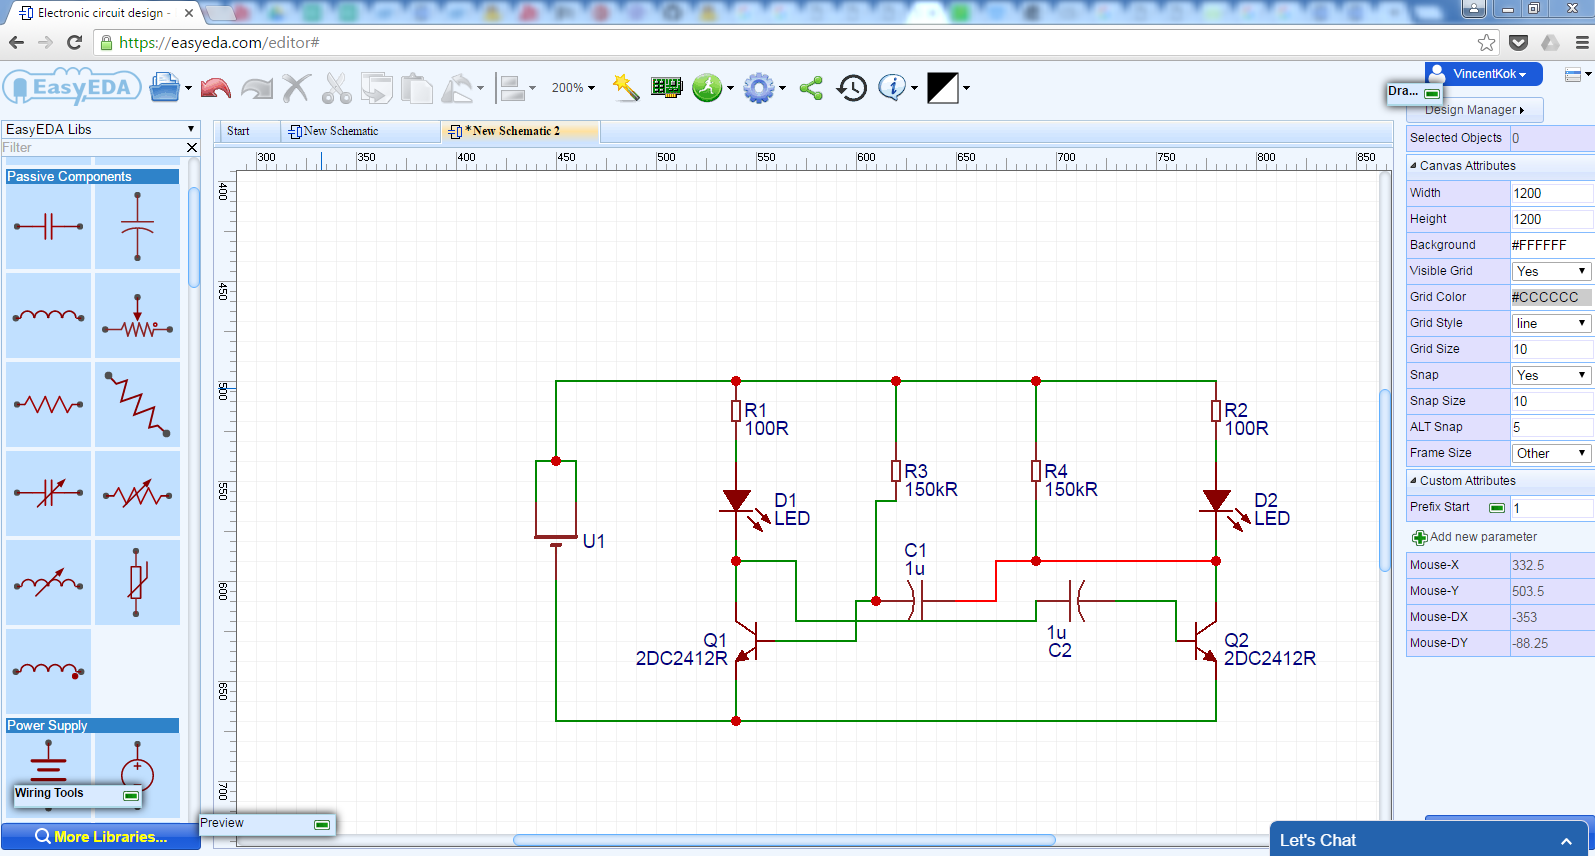 Vinctronics Review Of Easyeda Design Software